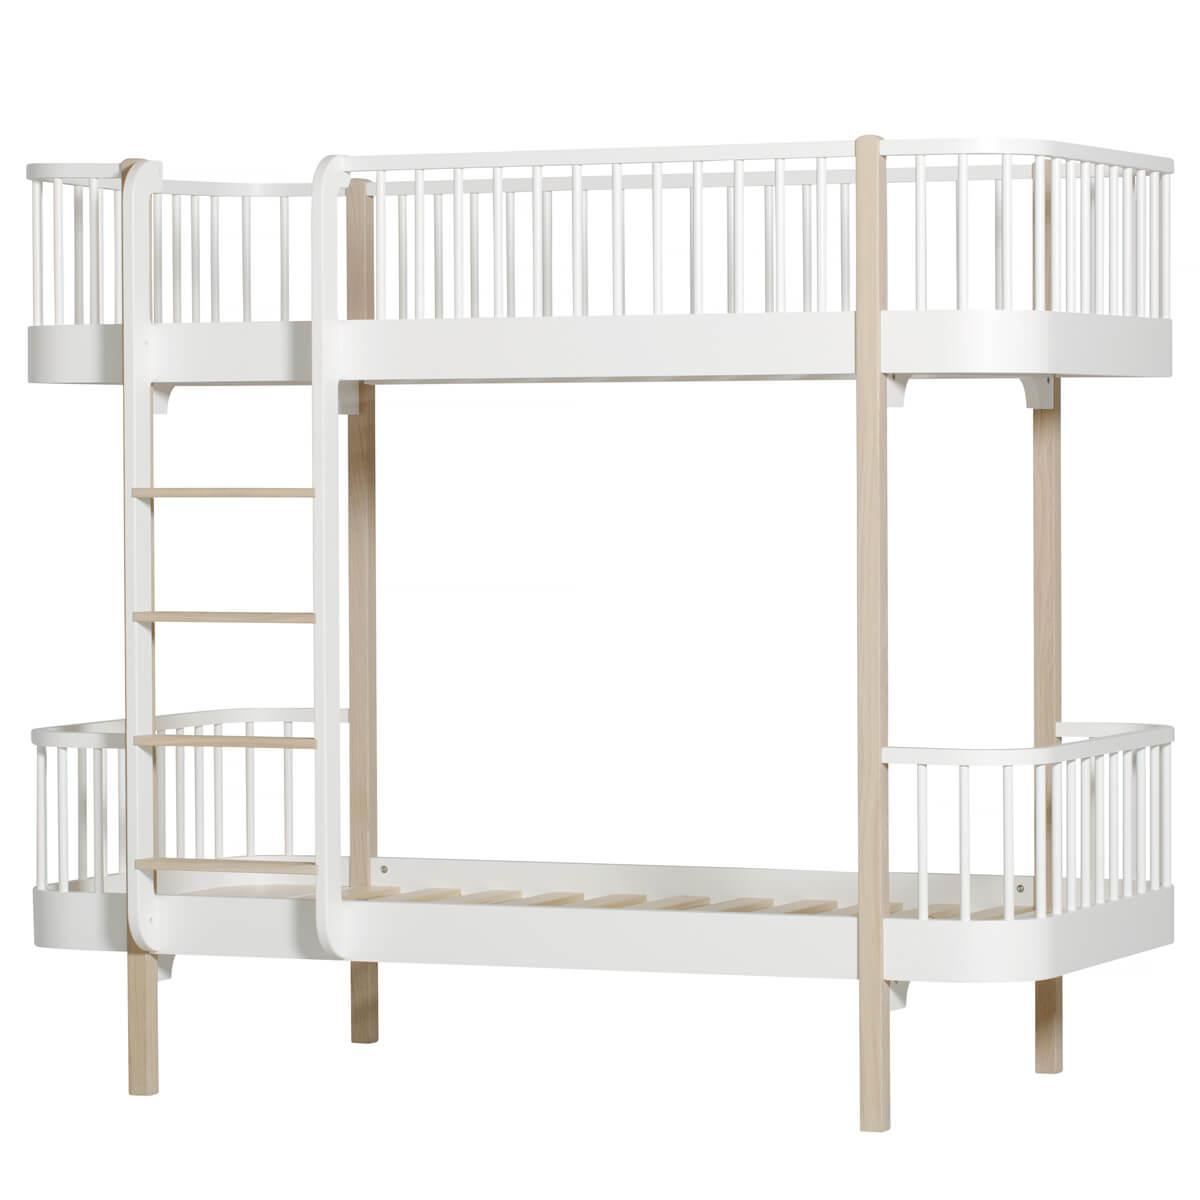 Lit évolutif superposé 90x200cm WOOD ORIGINAL Oliver Furniture blanc-chêne